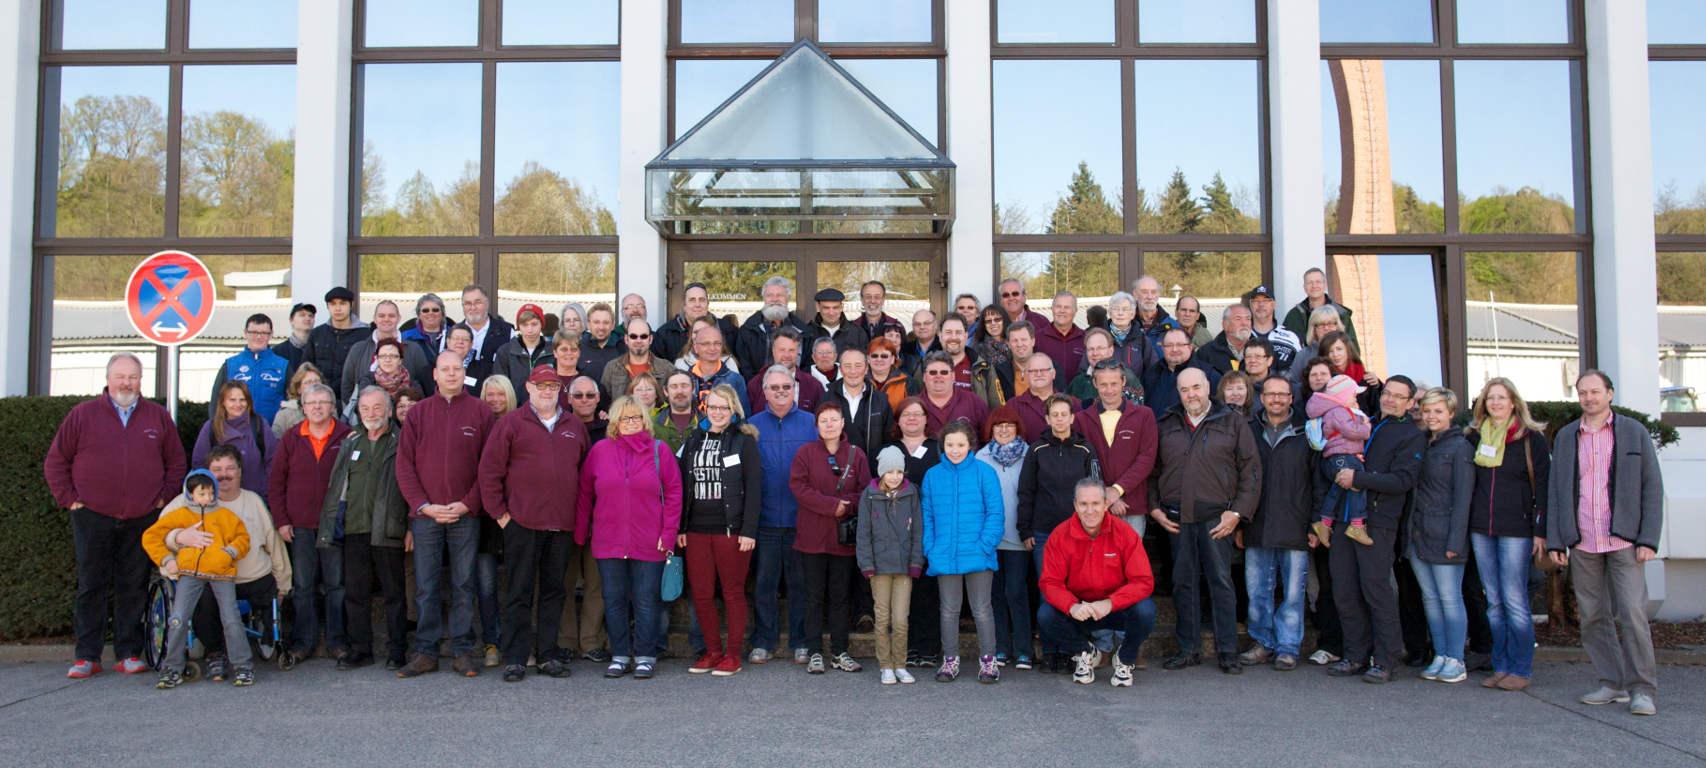 Tabbert-Camper-Forum besuchte Tabbert-Werk in Mottgers. © spothits/Tabbert